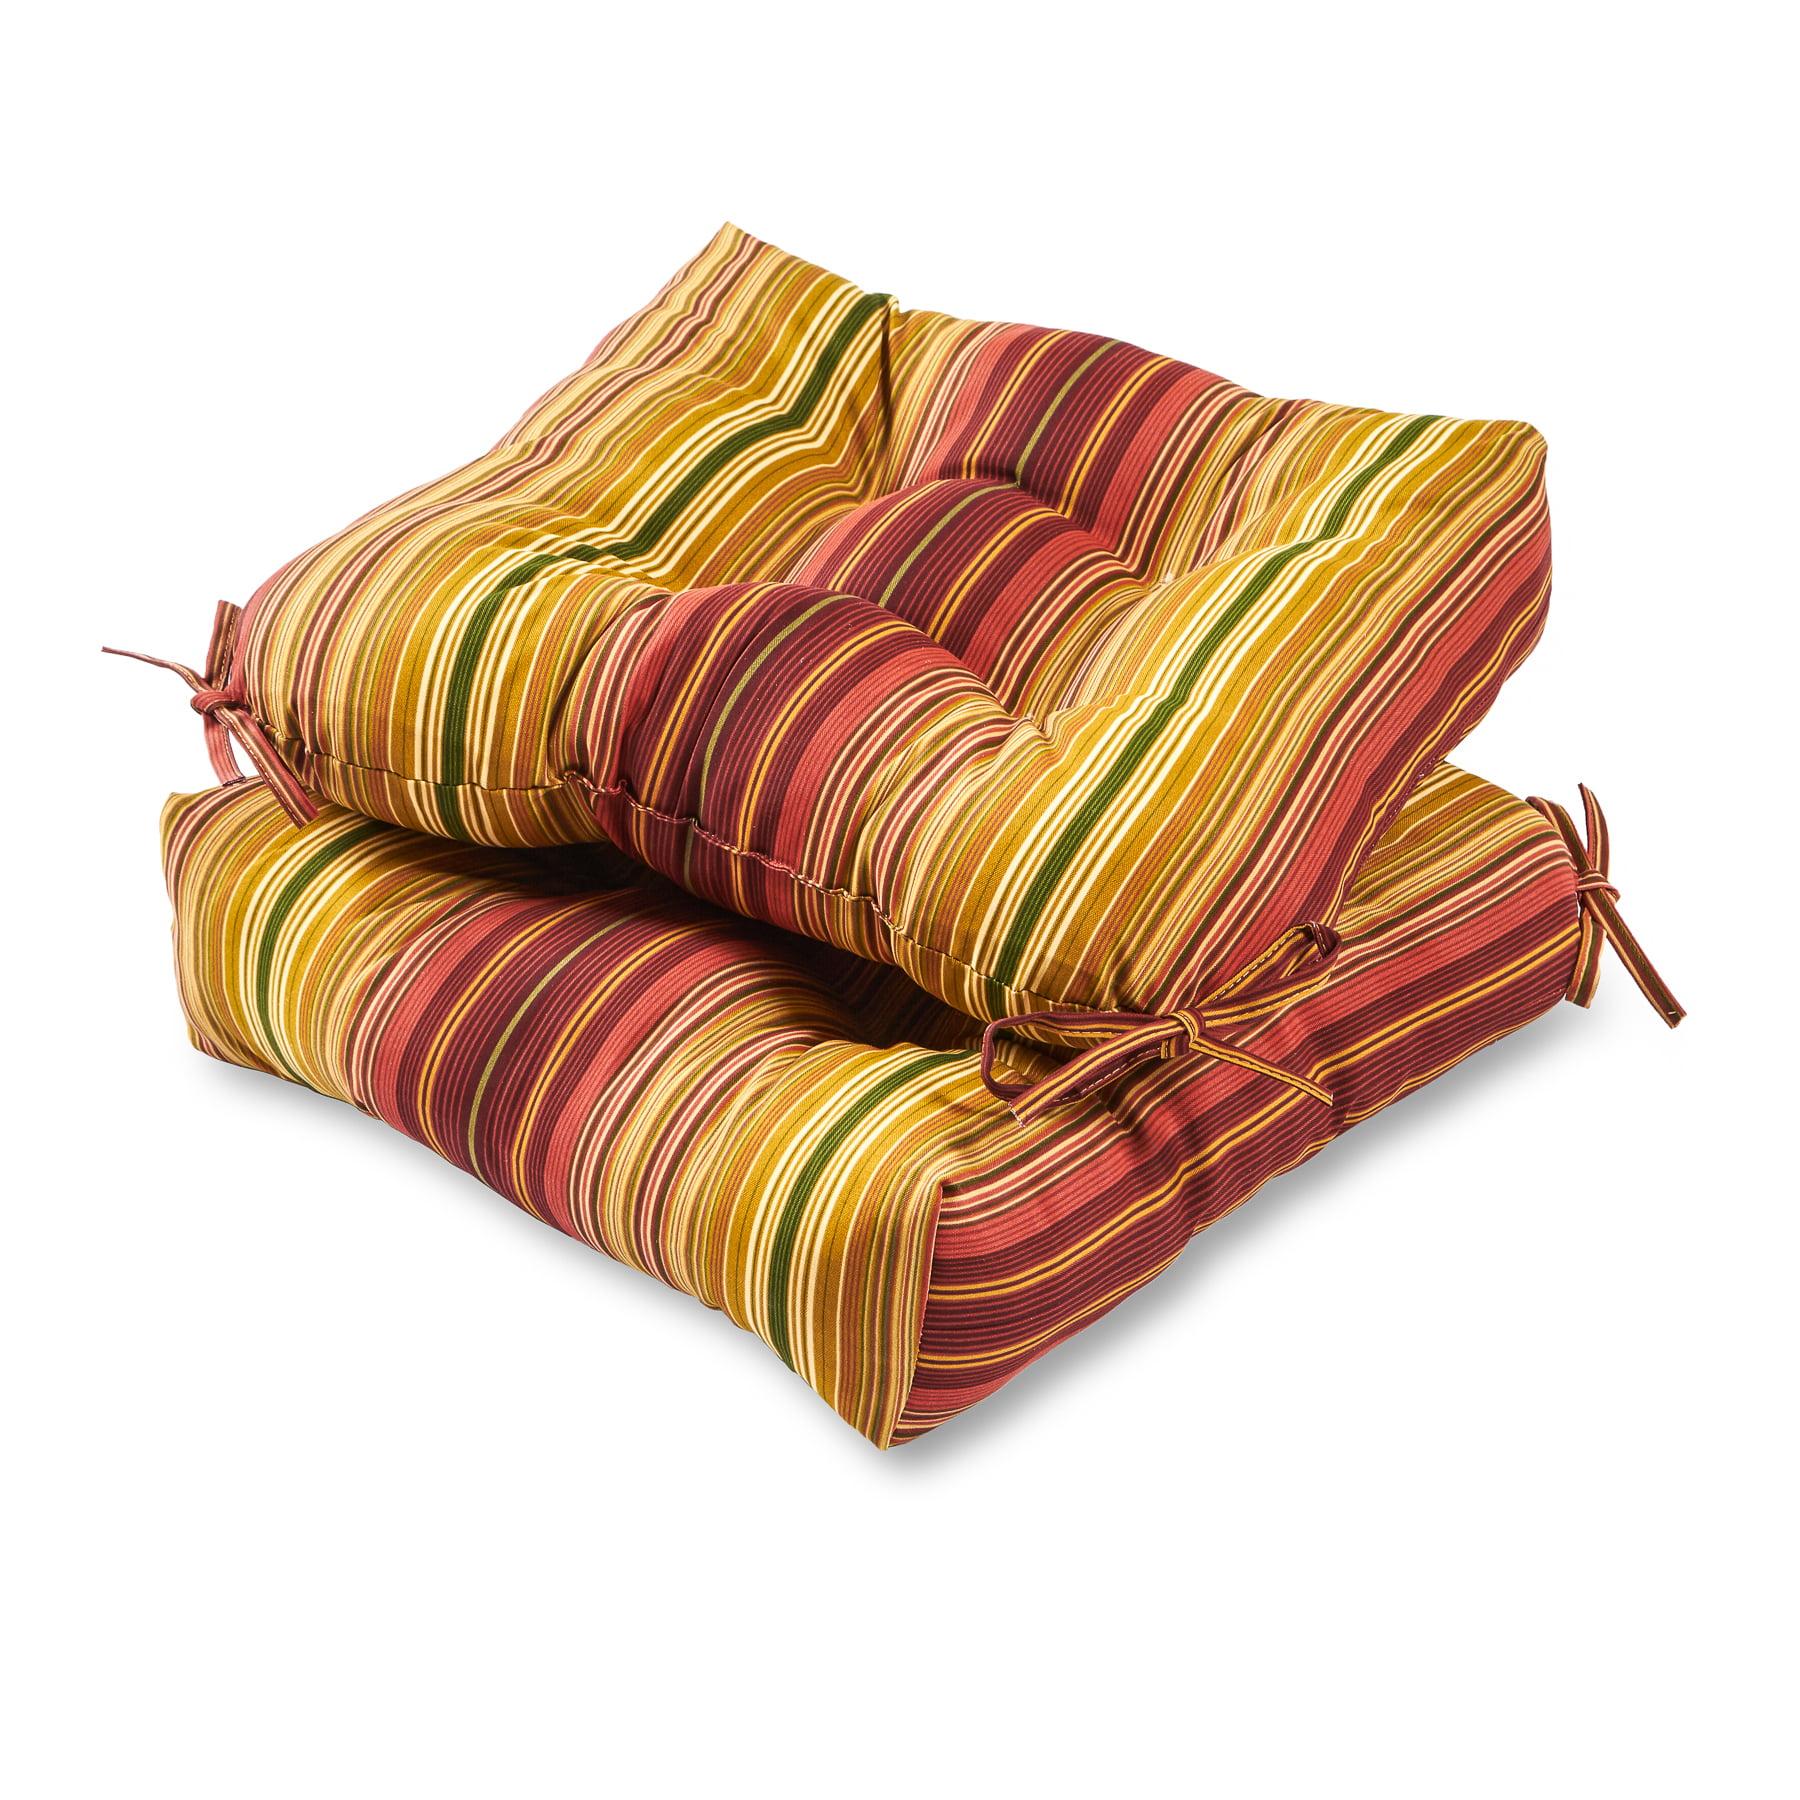 Greendale Home Fashions Kinnabari 20'' Outdoor Chair Cushion, Set of 2